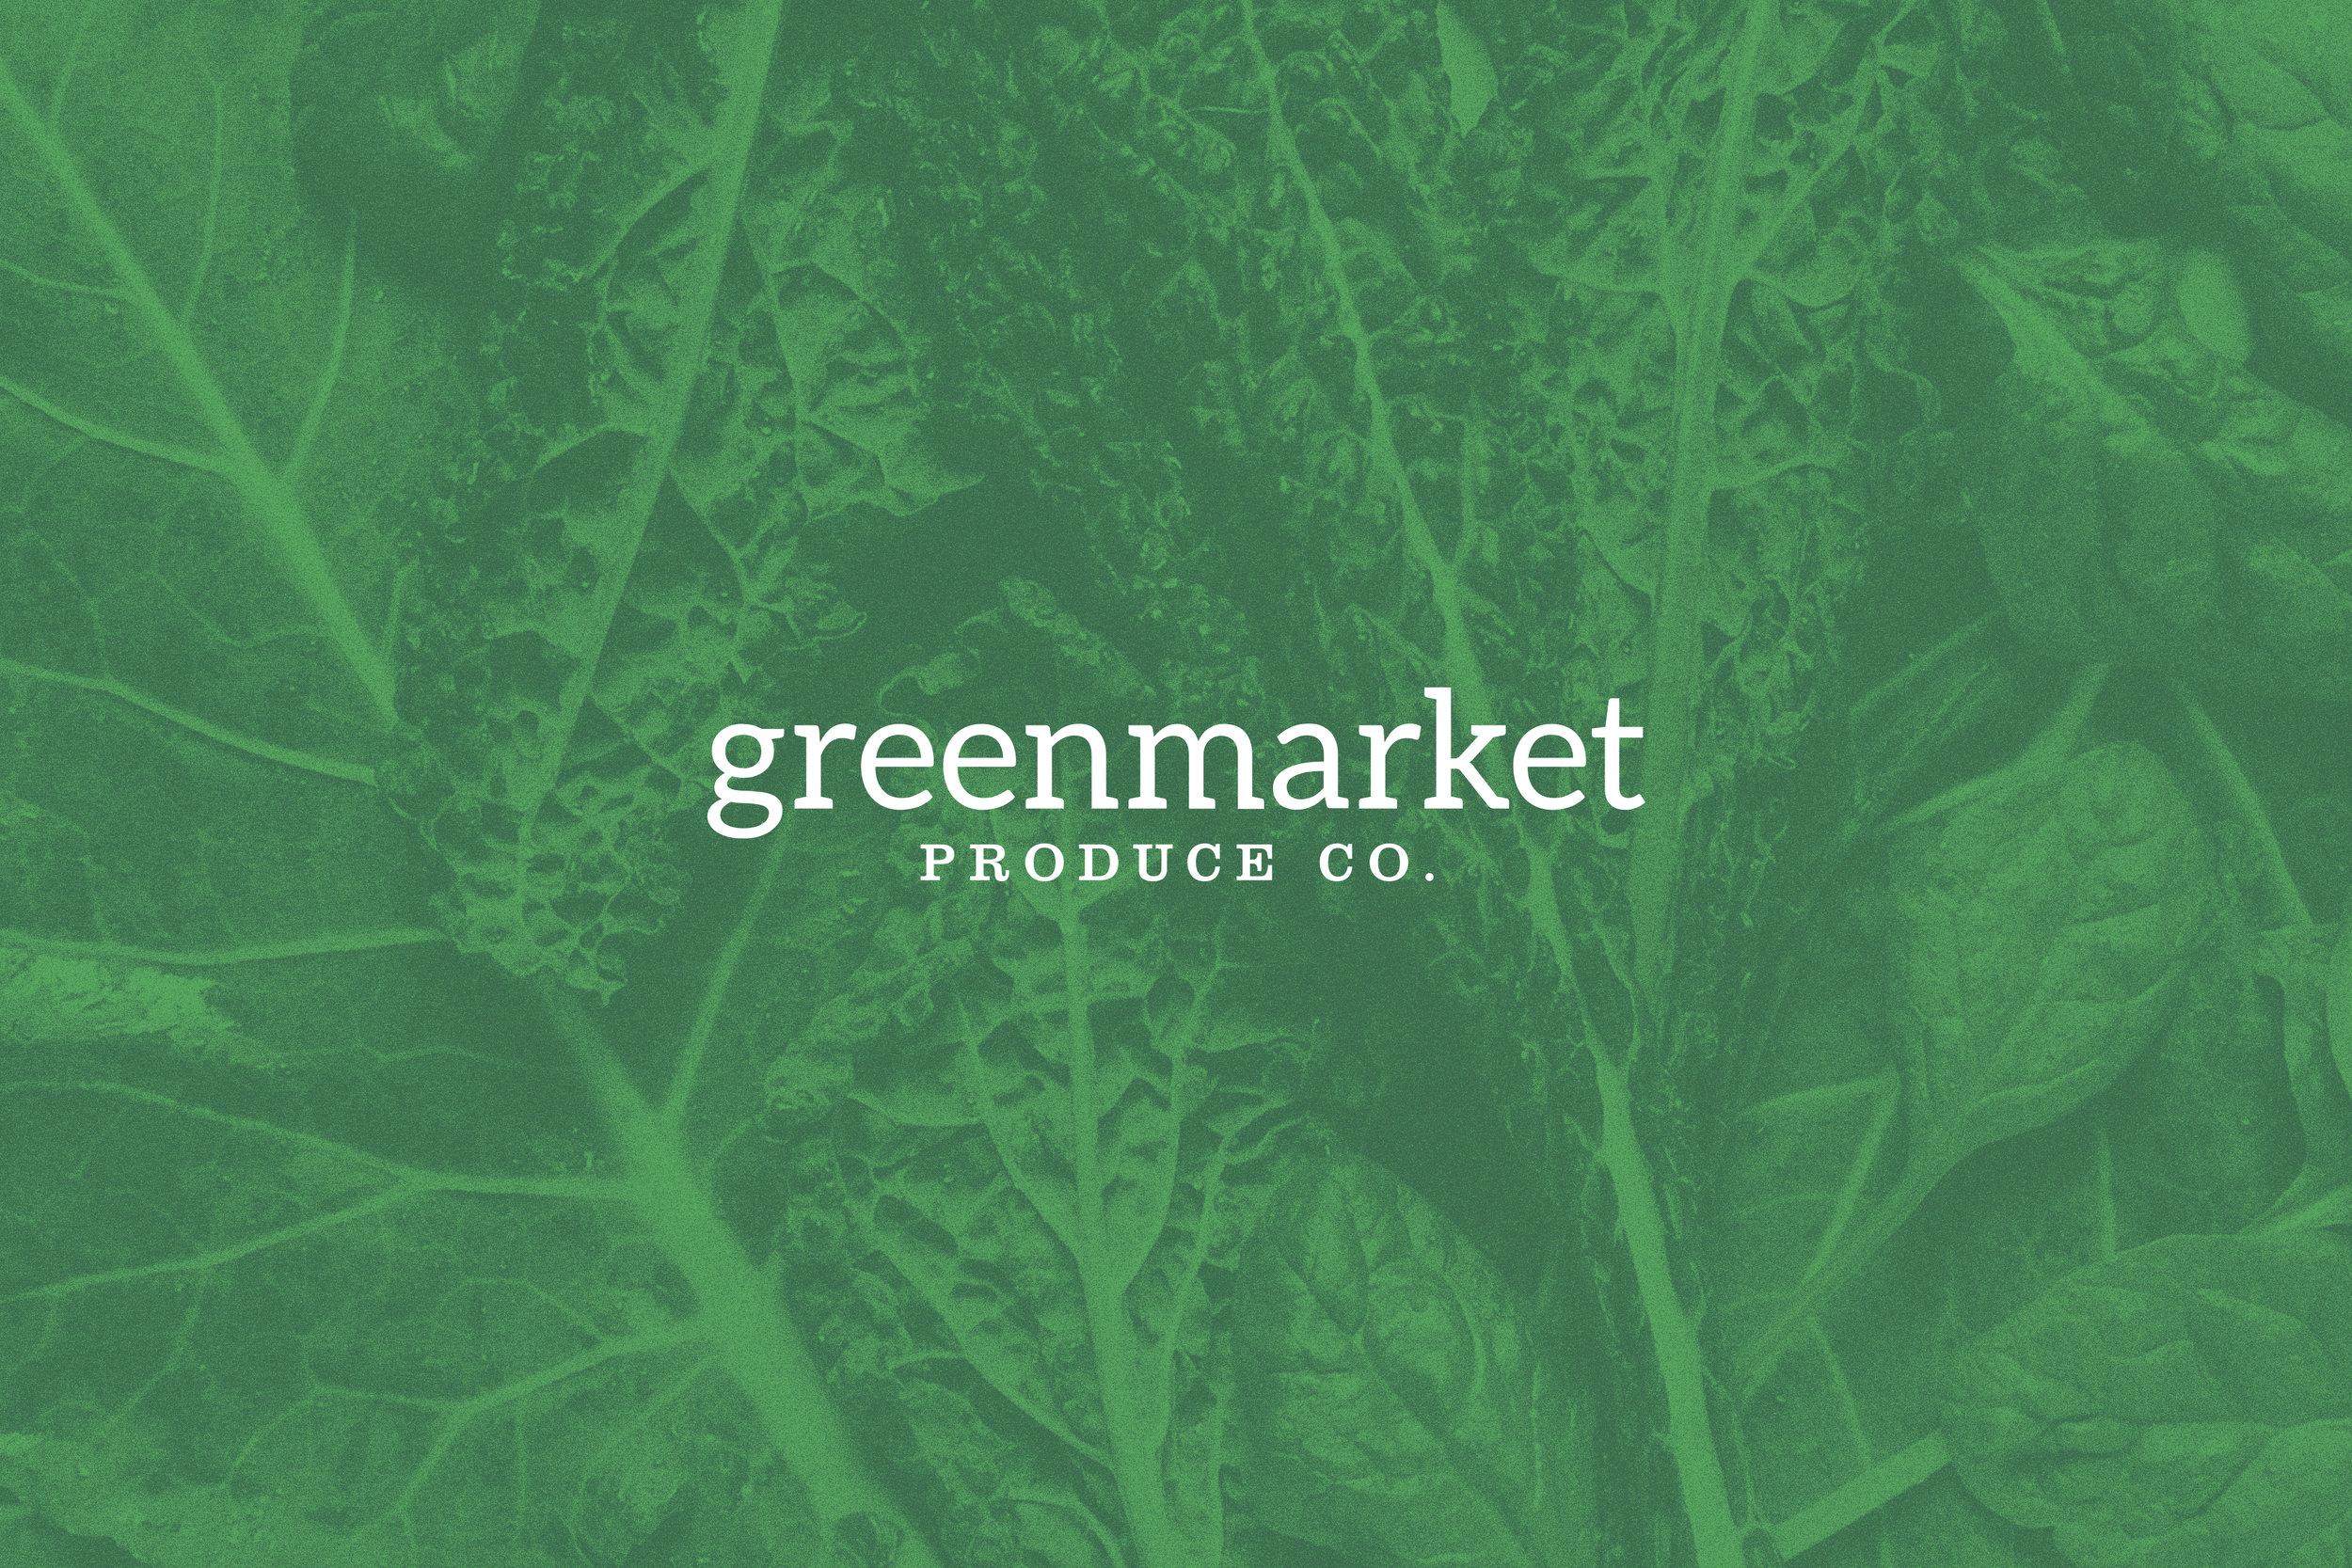 greenmarket_logo.jpg